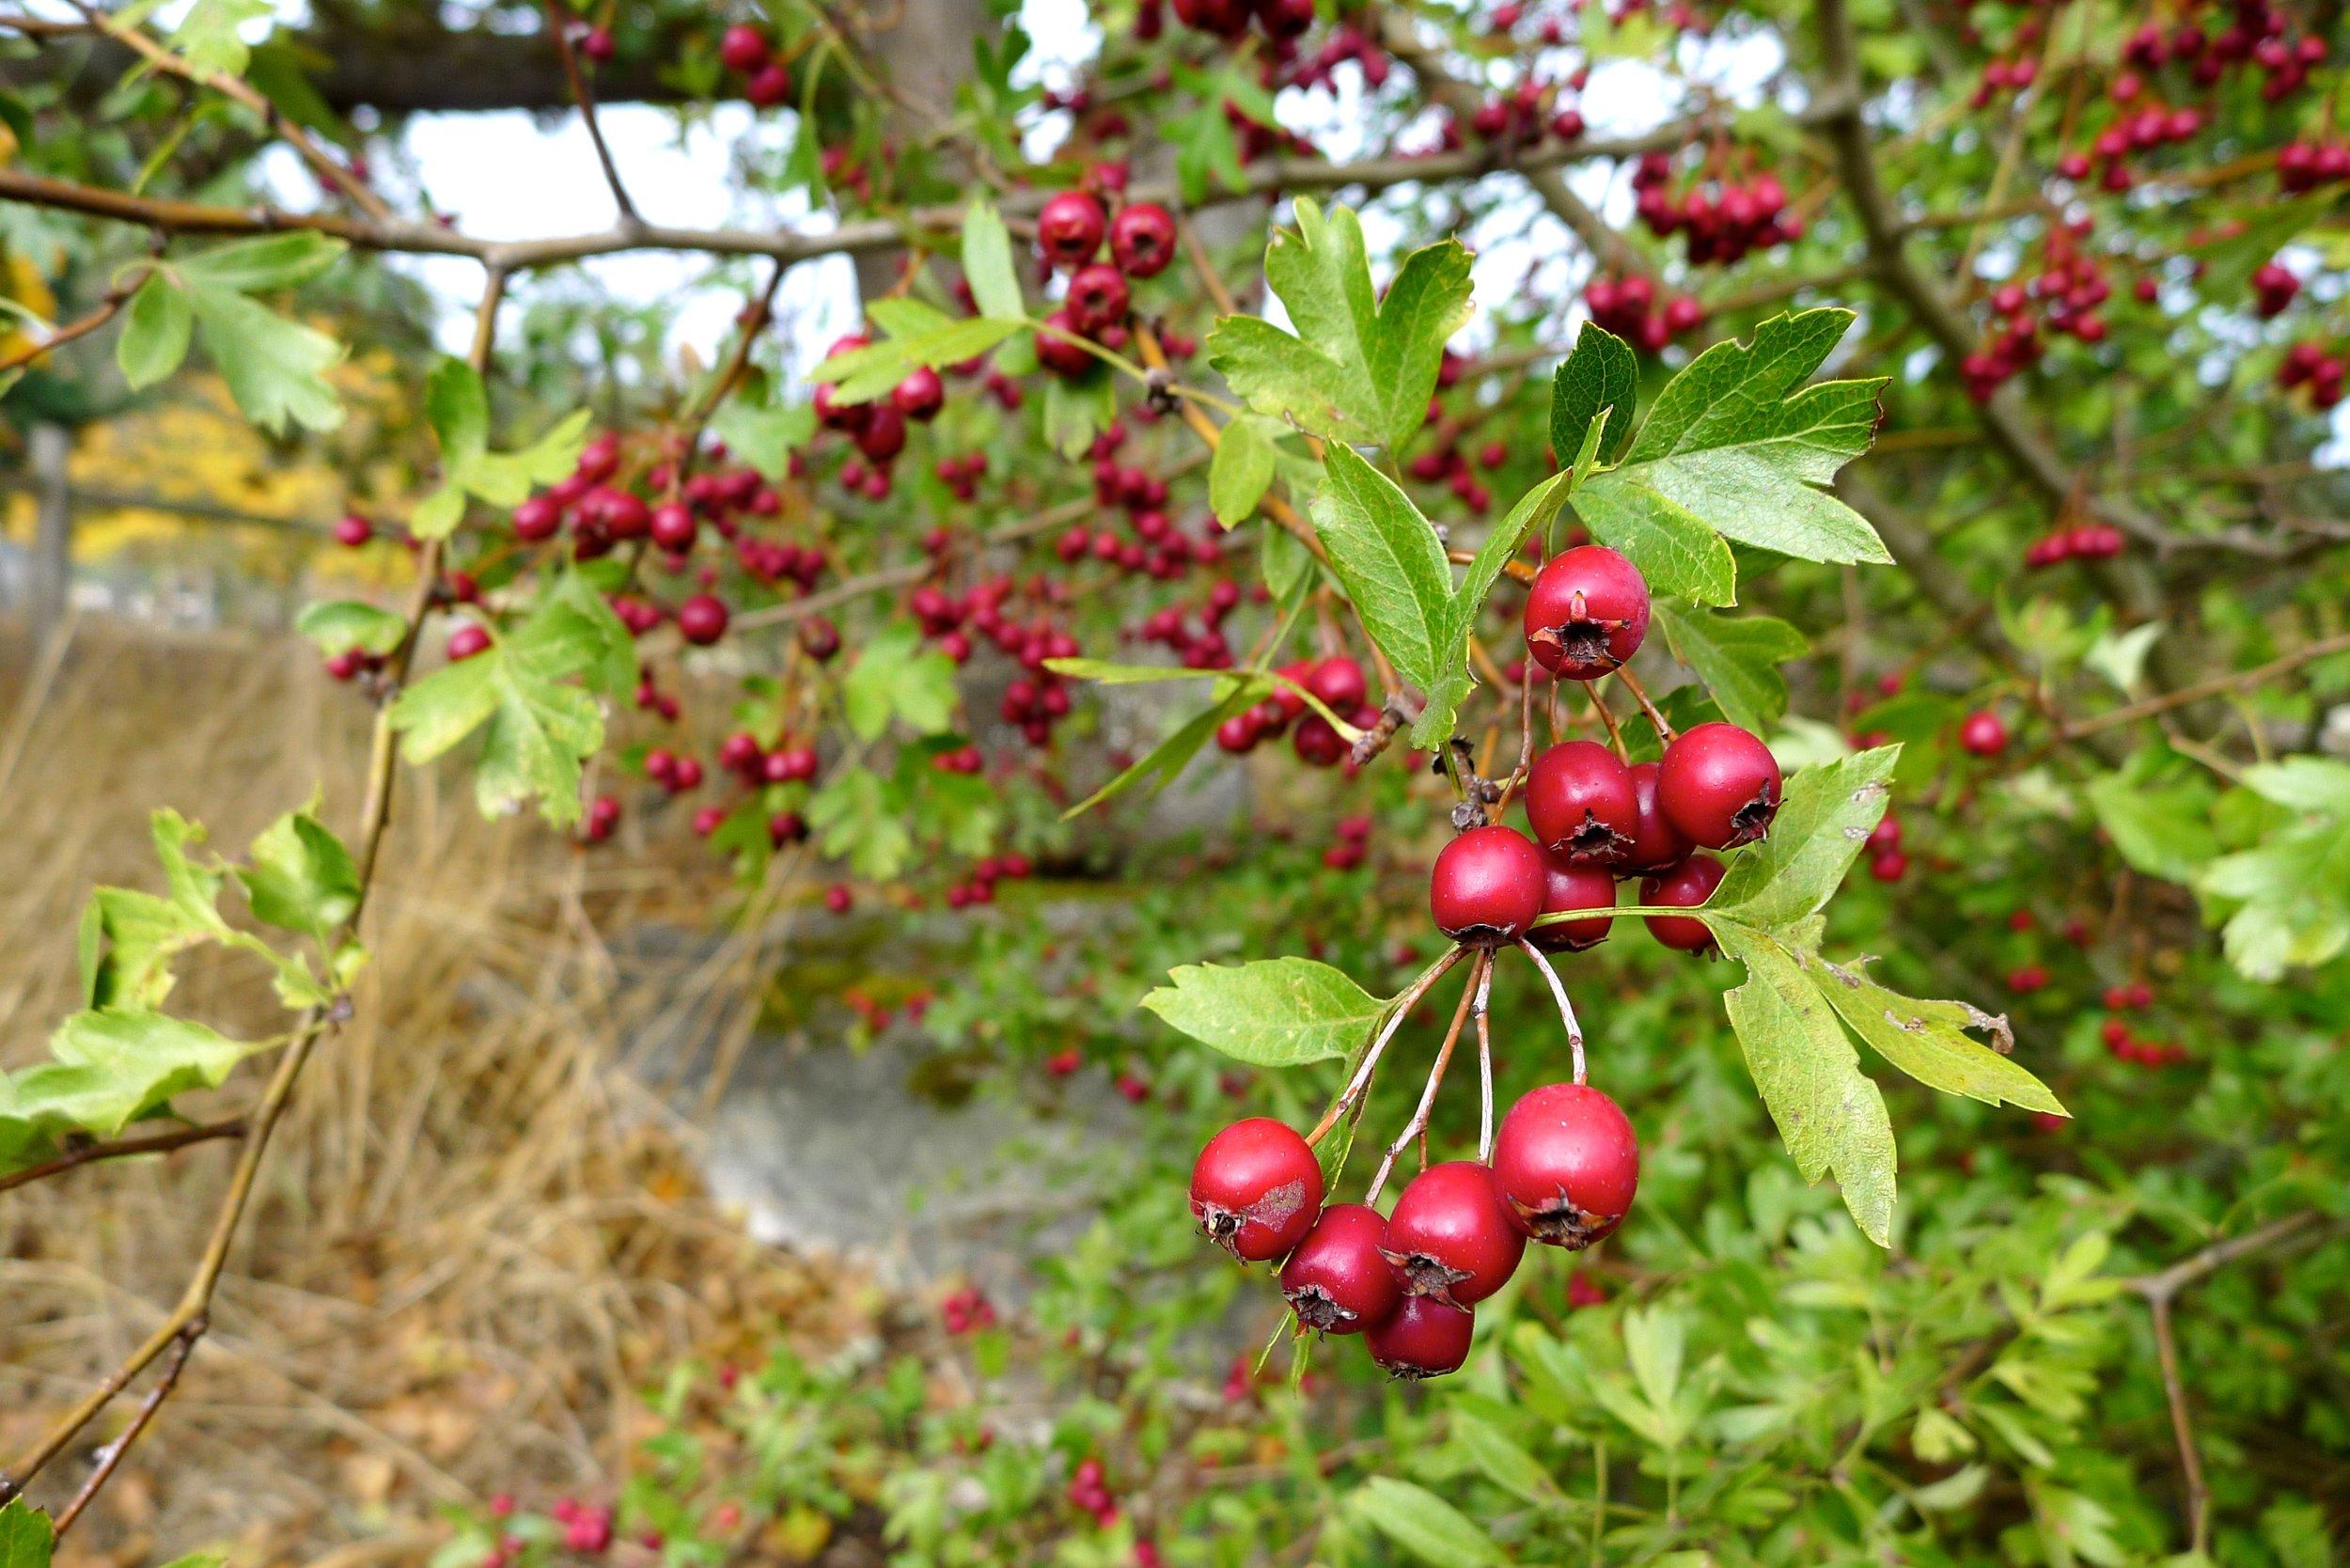 Crataegus spp. - Hawthorn Berry